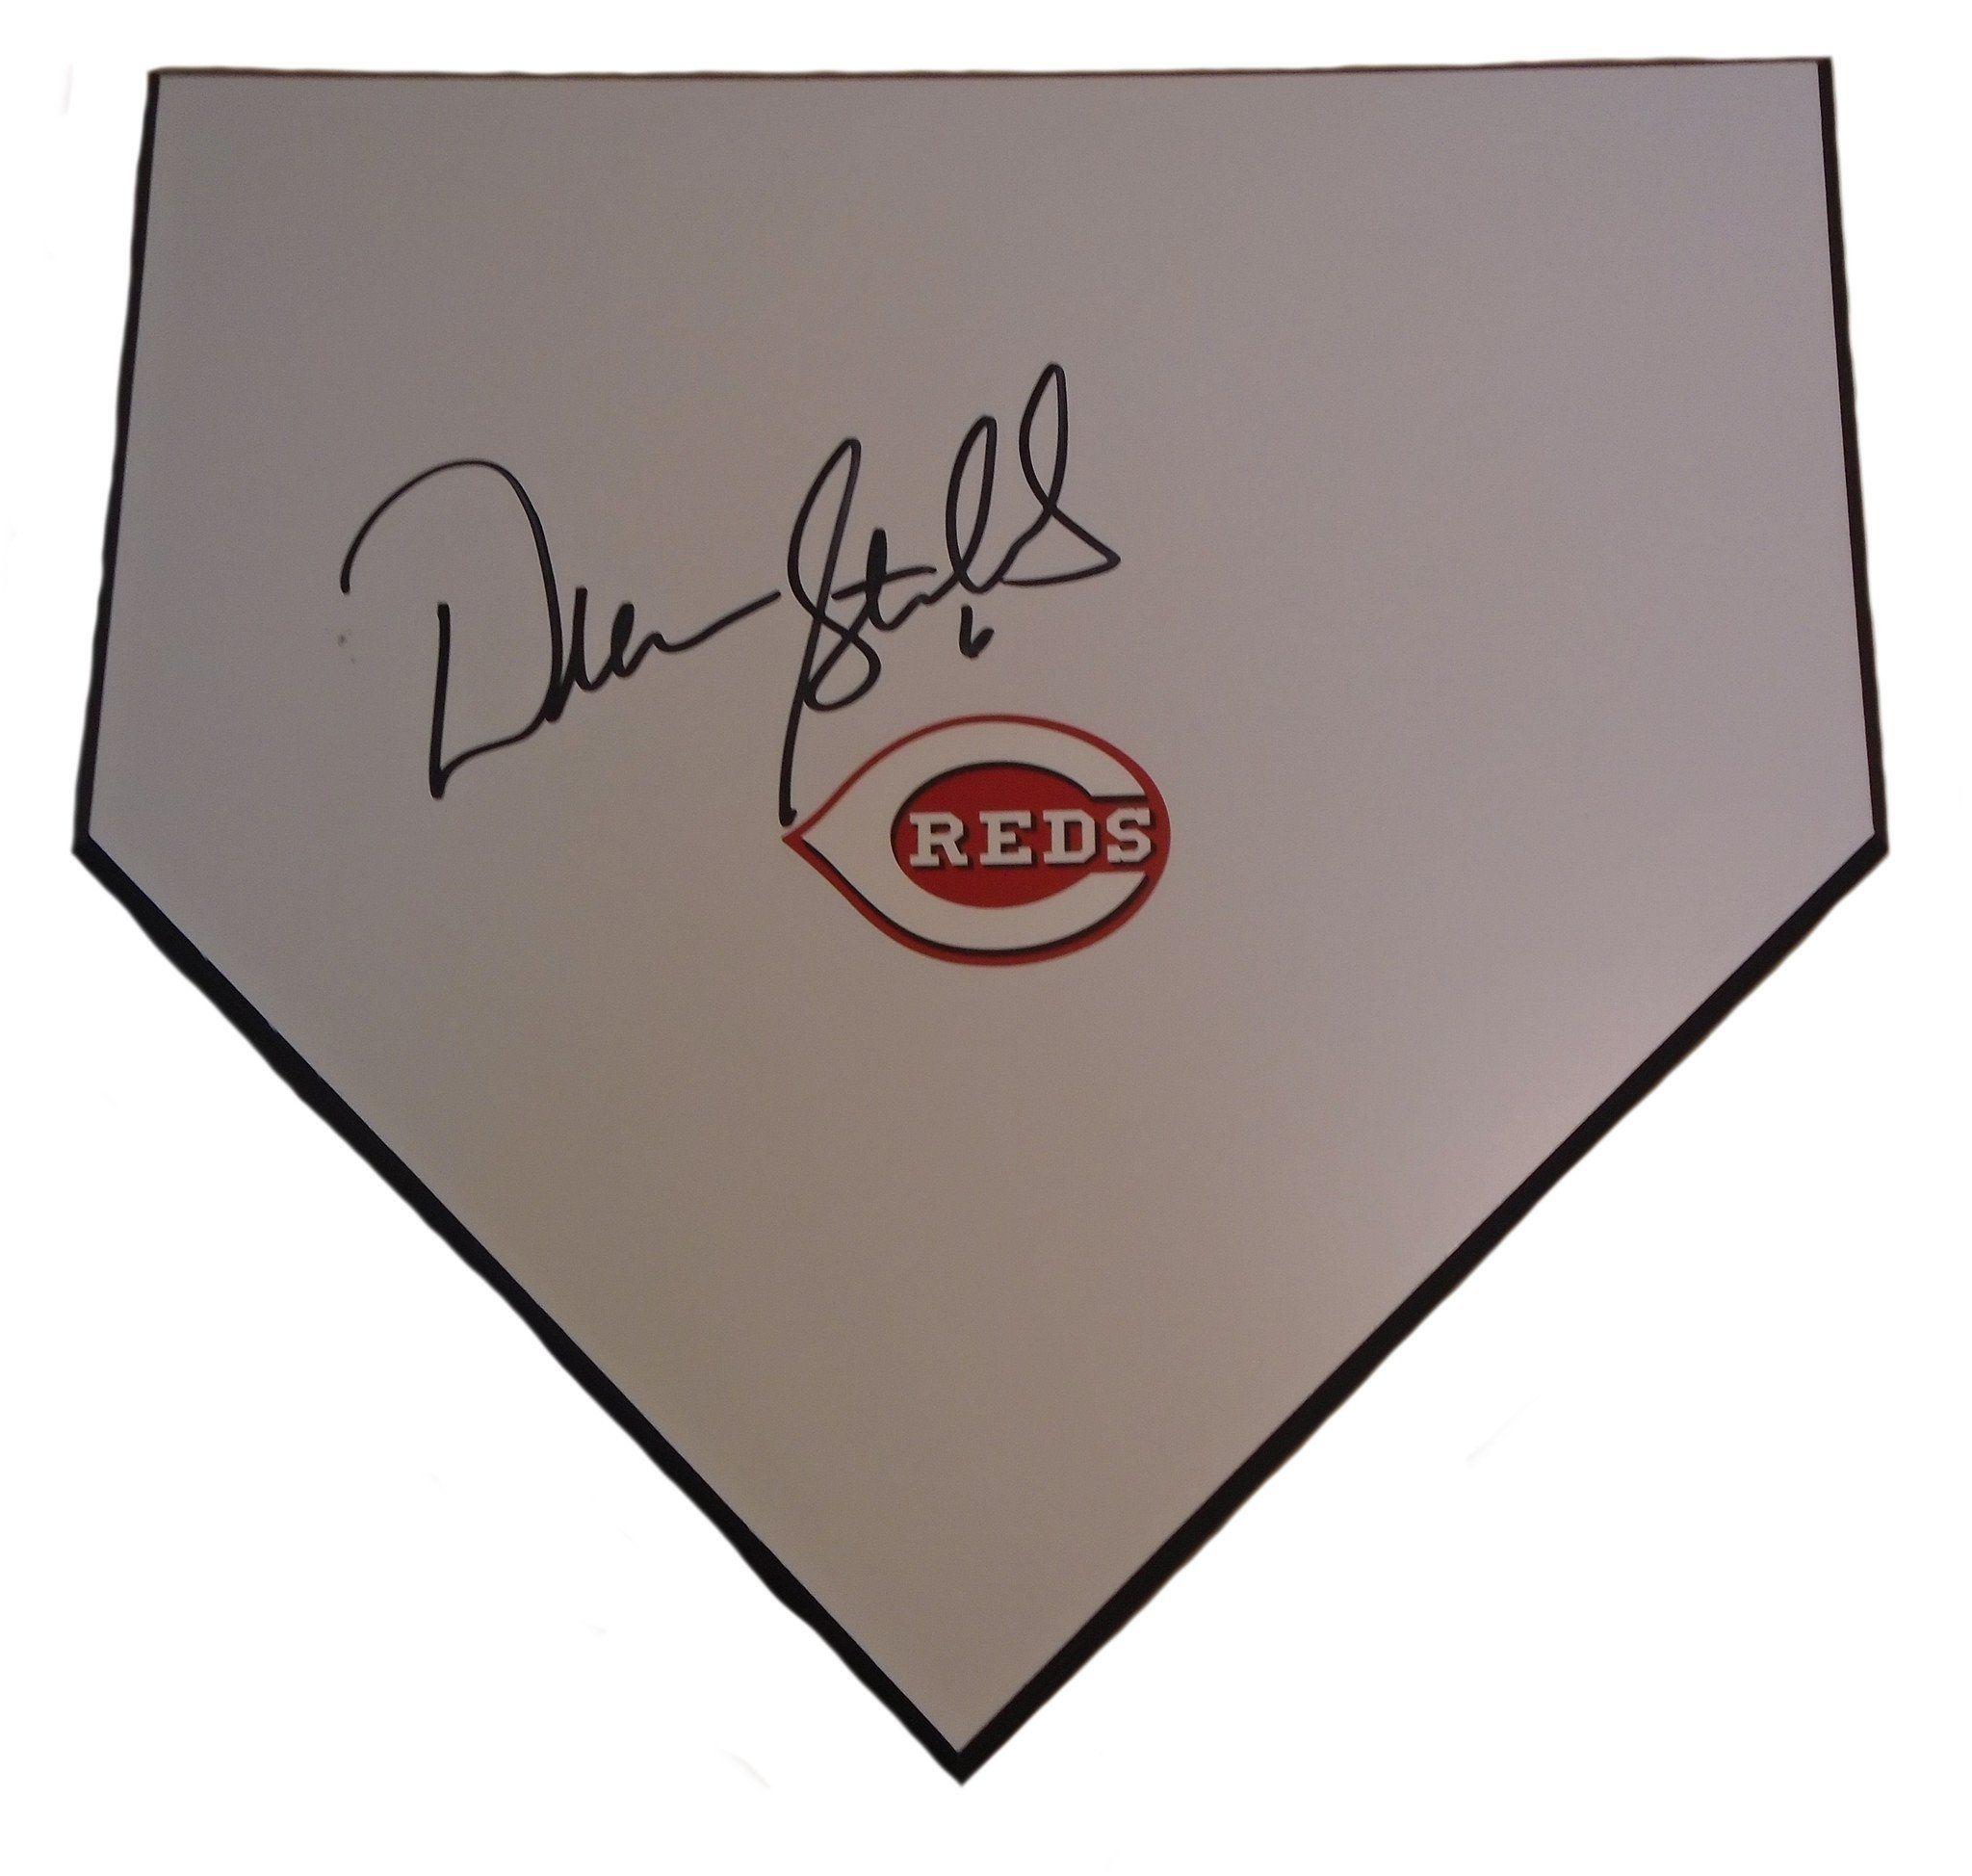 Peachy Drew Stubbs Autographed Cincinnati Reds Baseball Home Plate Download Free Architecture Designs Rallybritishbridgeorg